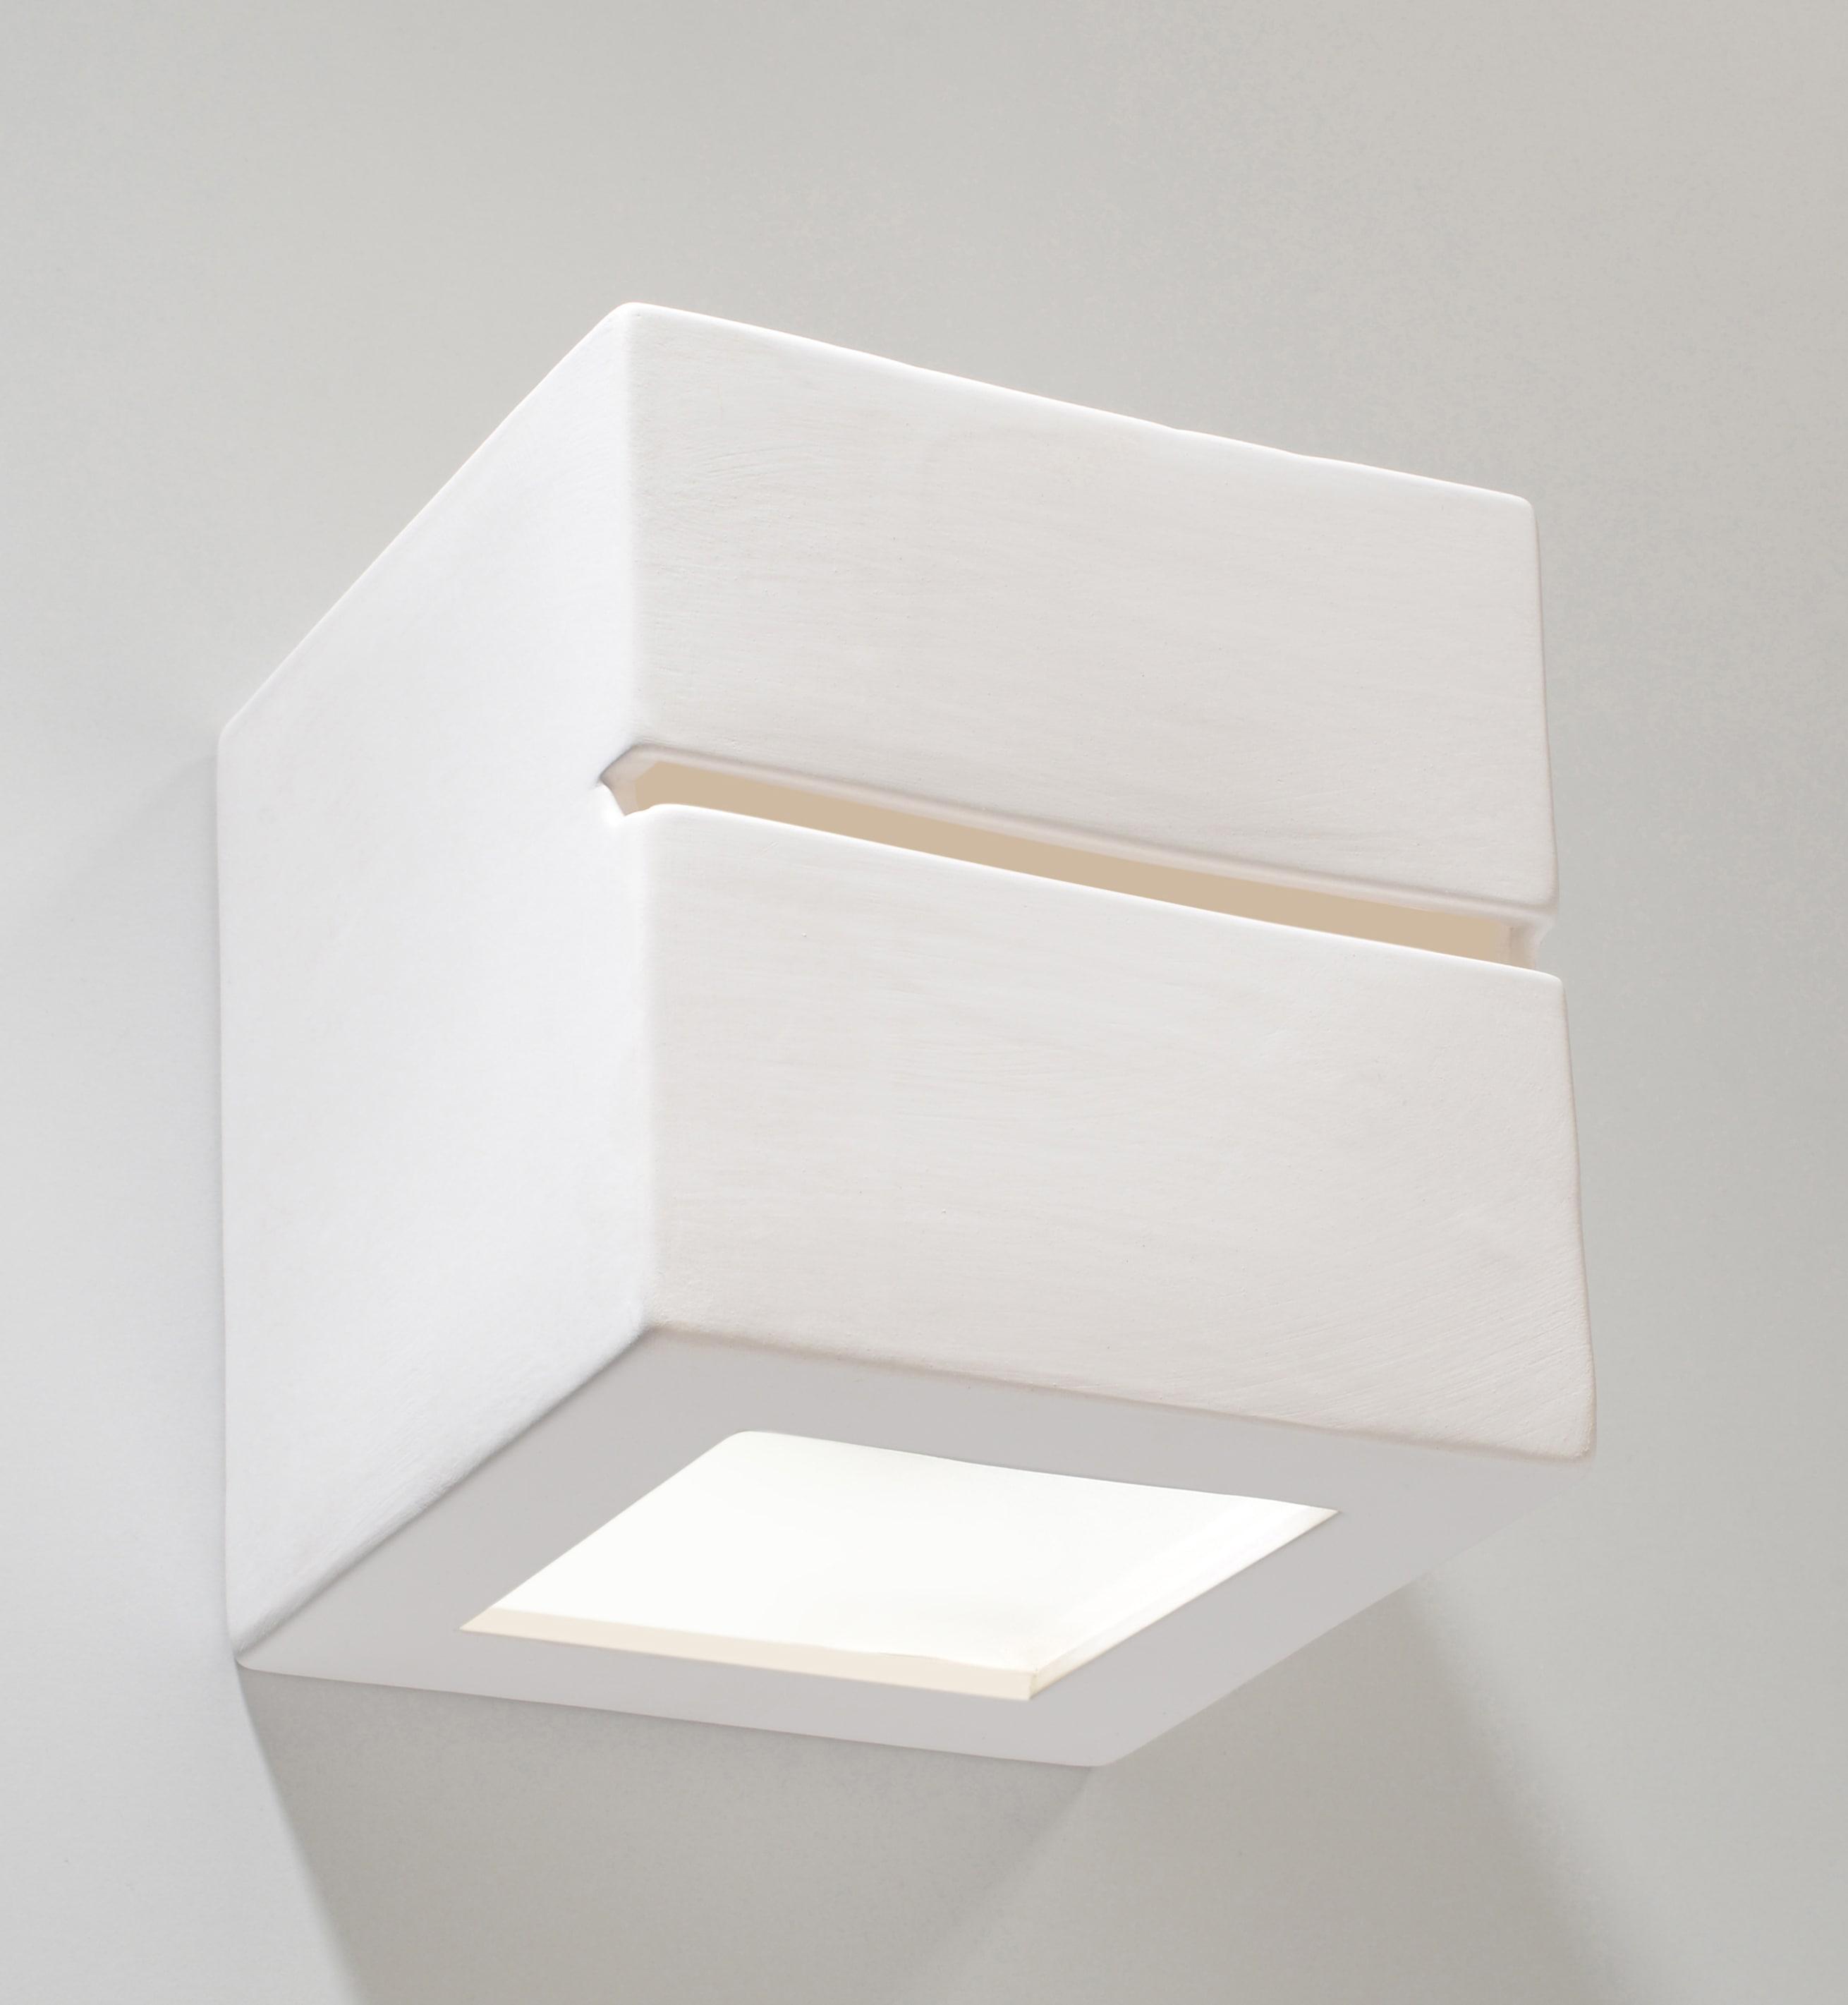 SOLLUX lighting Wandleuchte LEO LINE, E27, 1 St.